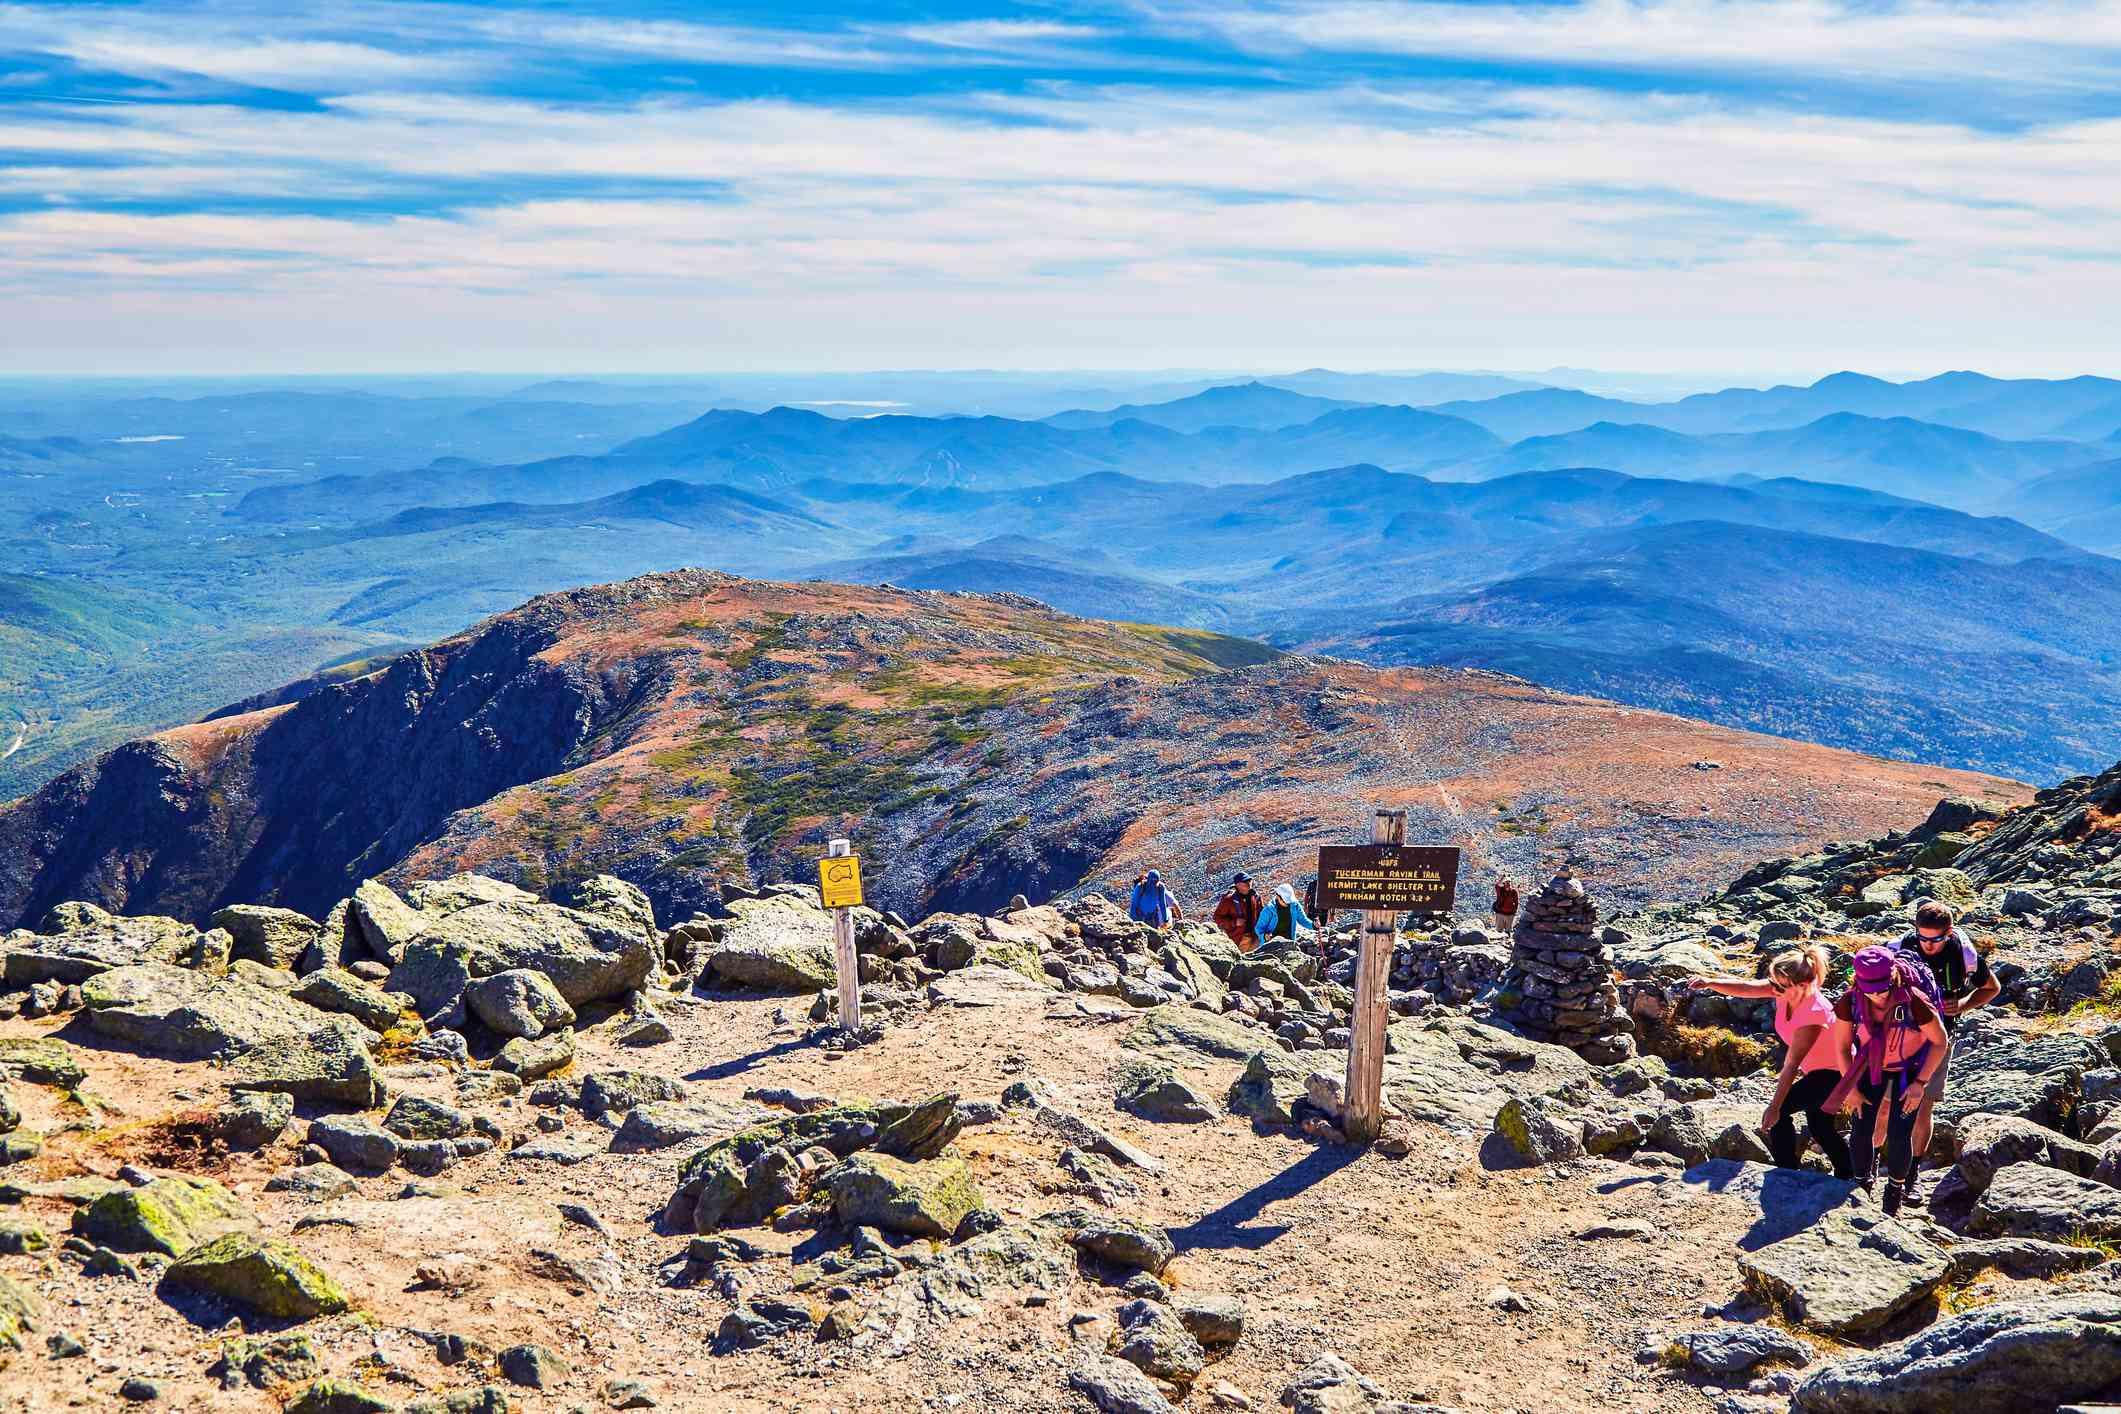 people on a rocky mountain summit